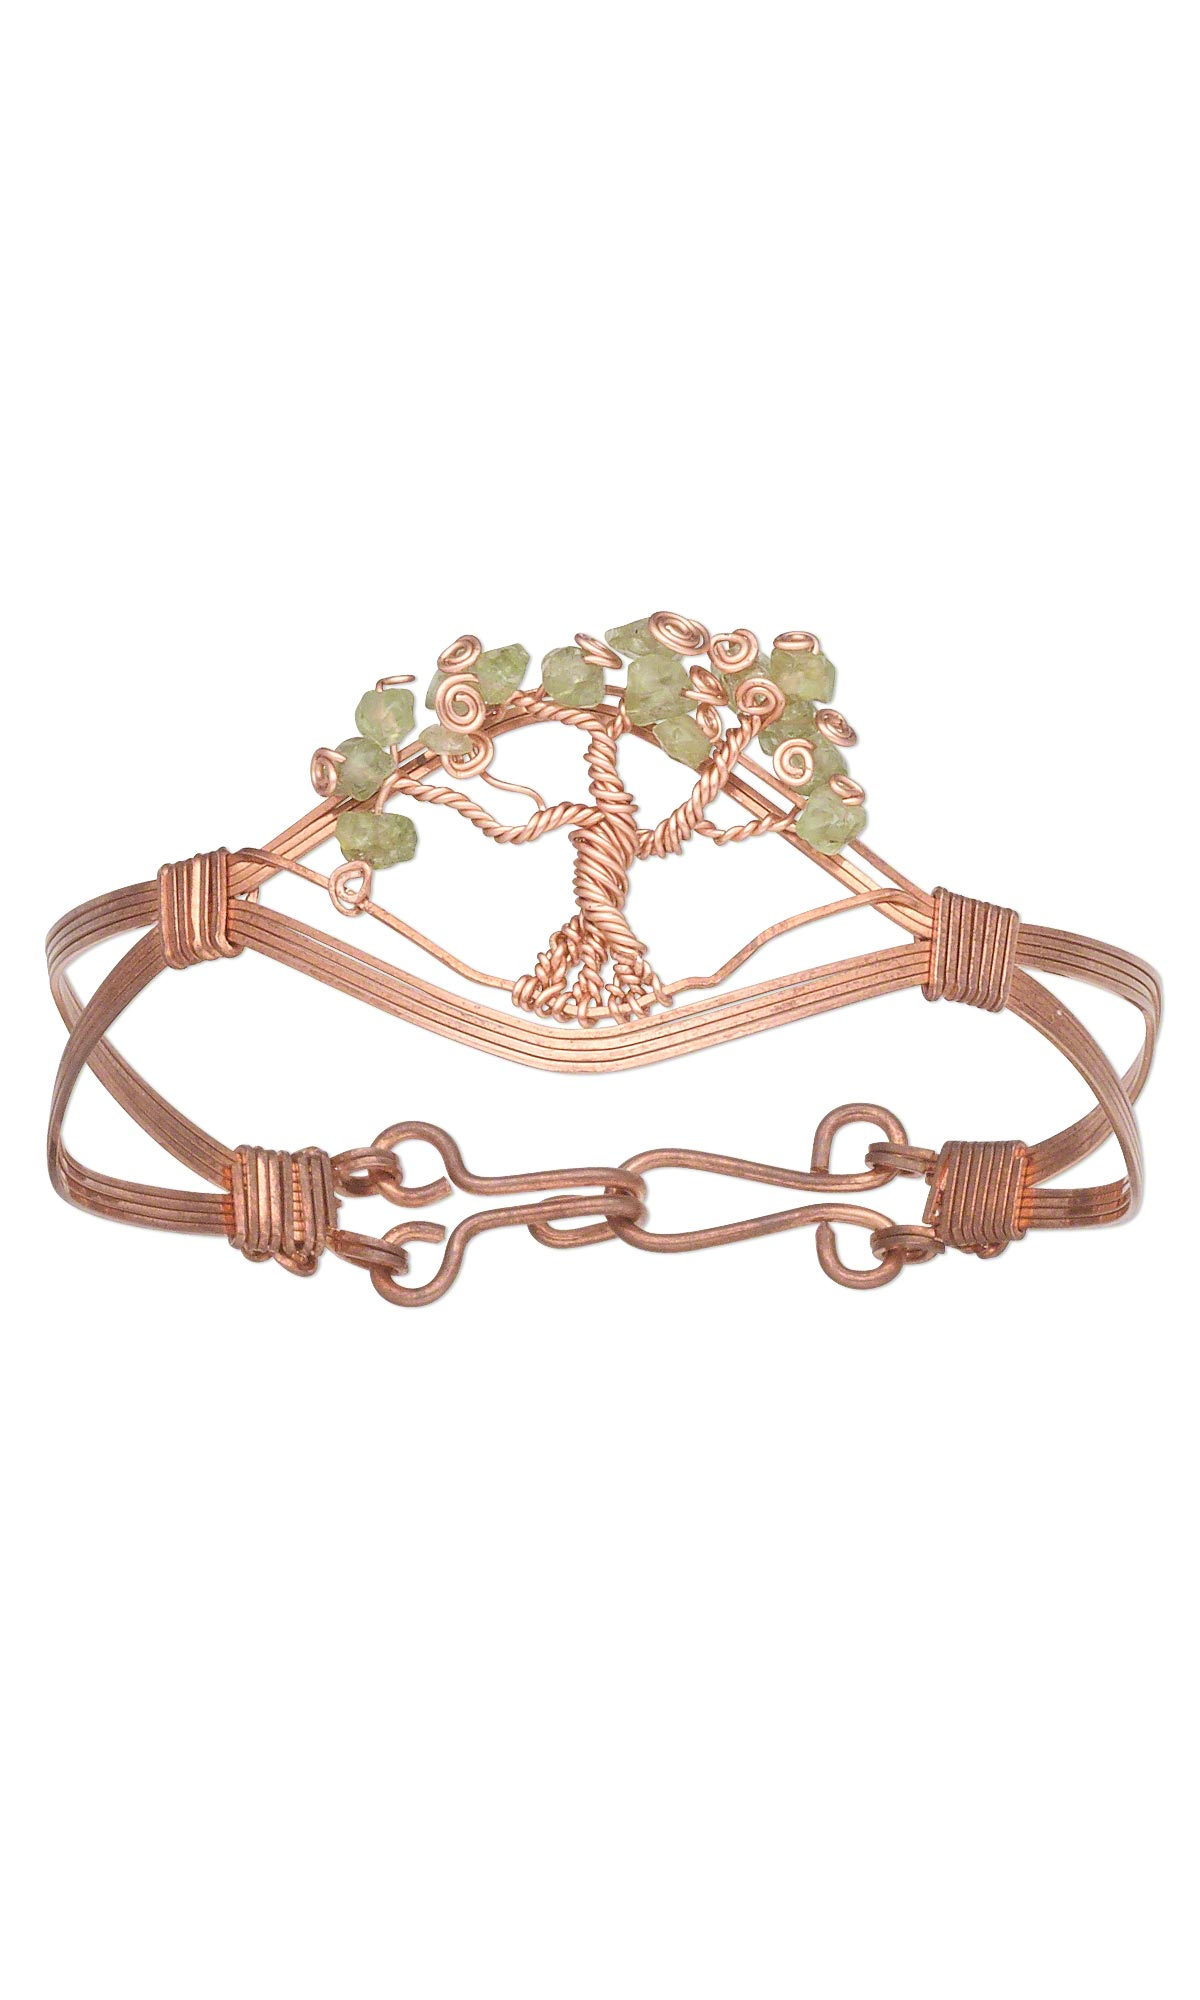 Jewelry Design - Double-Strand Bracelet with Peridot Gemstone Chips ...